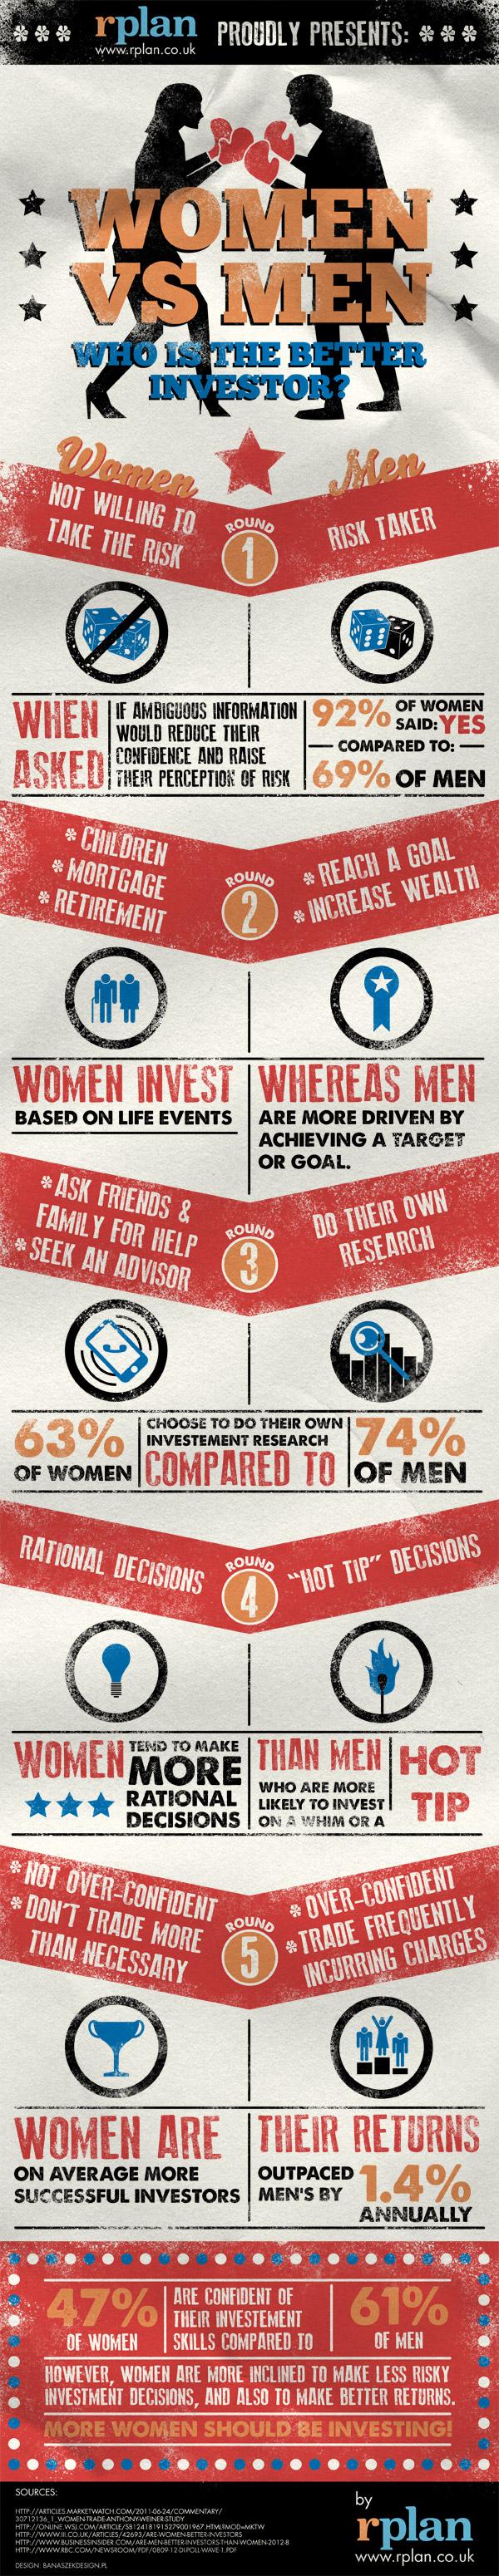 women-vs-men--who-is-the-better-investor_50aa6ae44b918